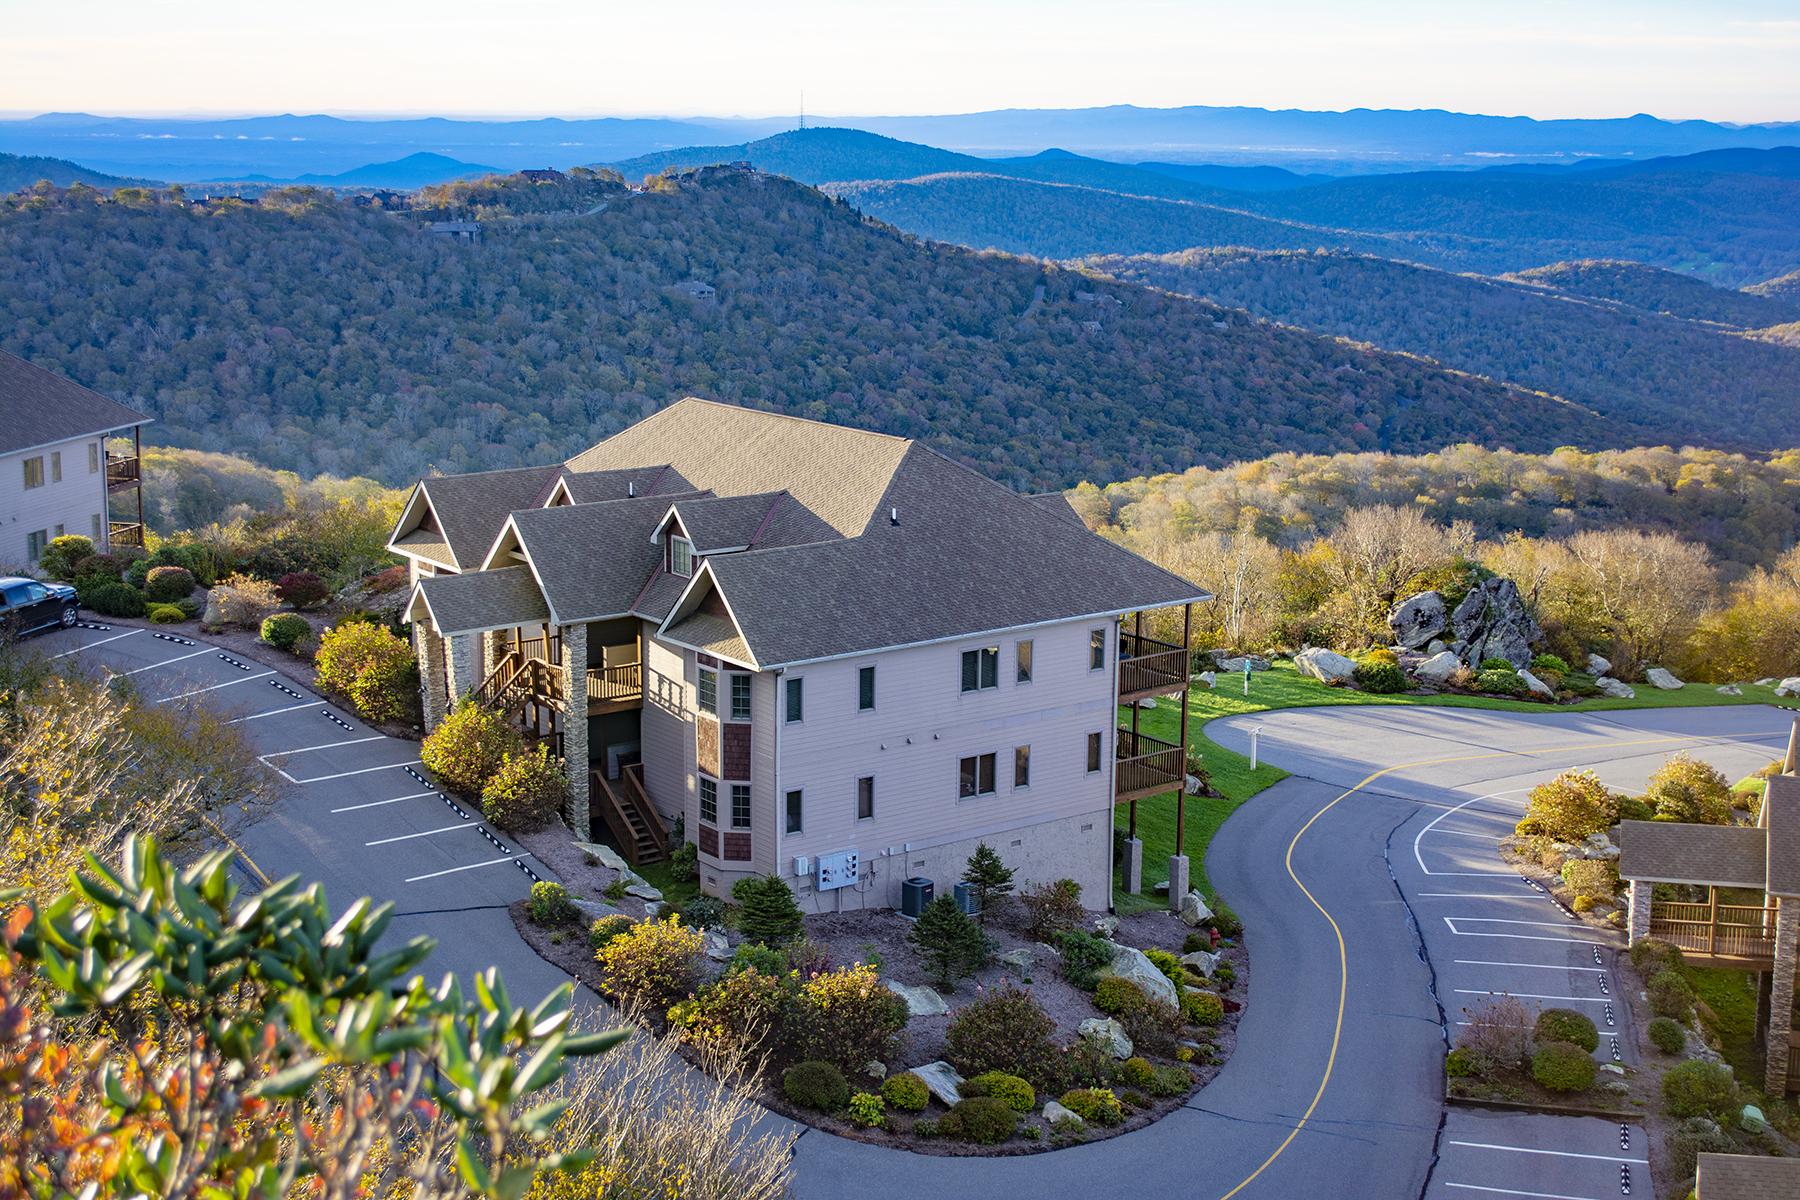 Condominium for Active at SUGAR MOUNTAIN - THE RESERVE AT SUGAR MOUNTAIN 166 Trails End Dr , D Sugar Mountain, North Carolina 28604 United States